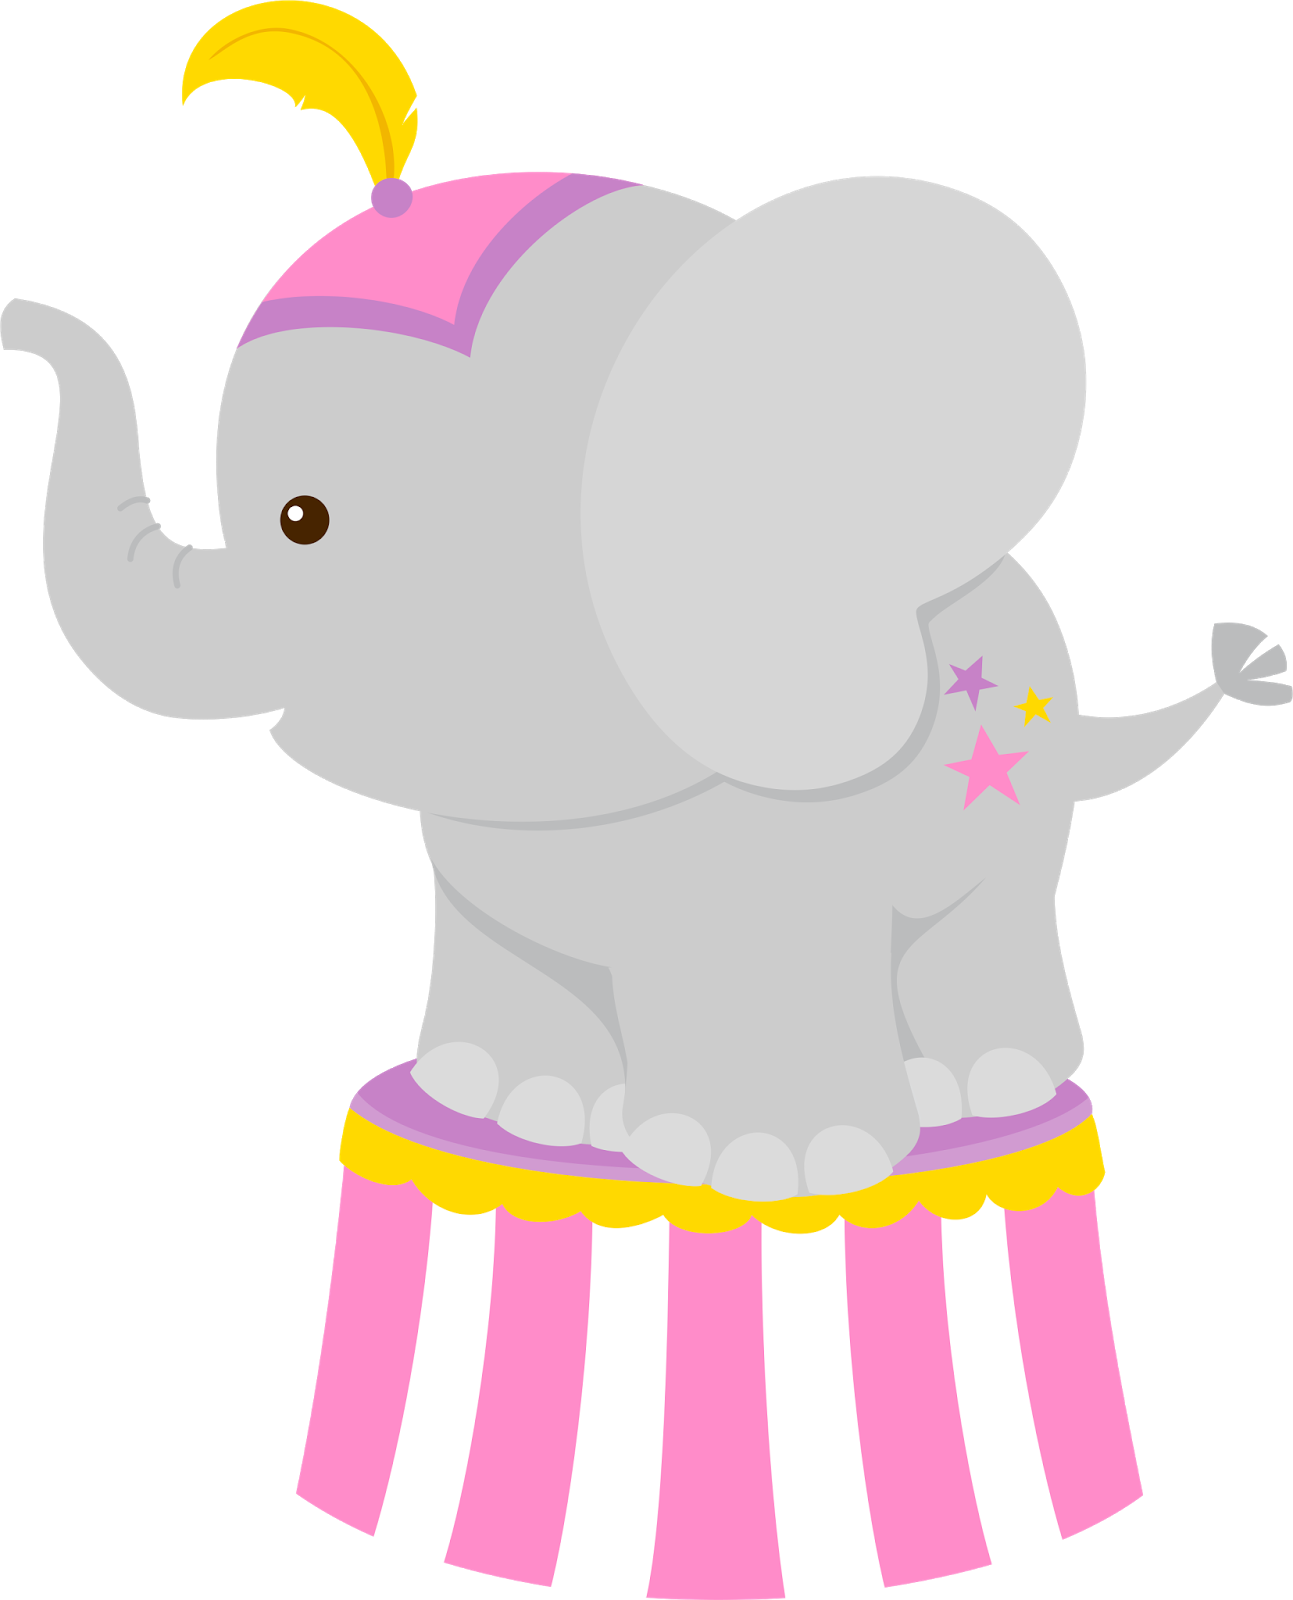 Clown girls png cumplea. Graduation clipart elephant